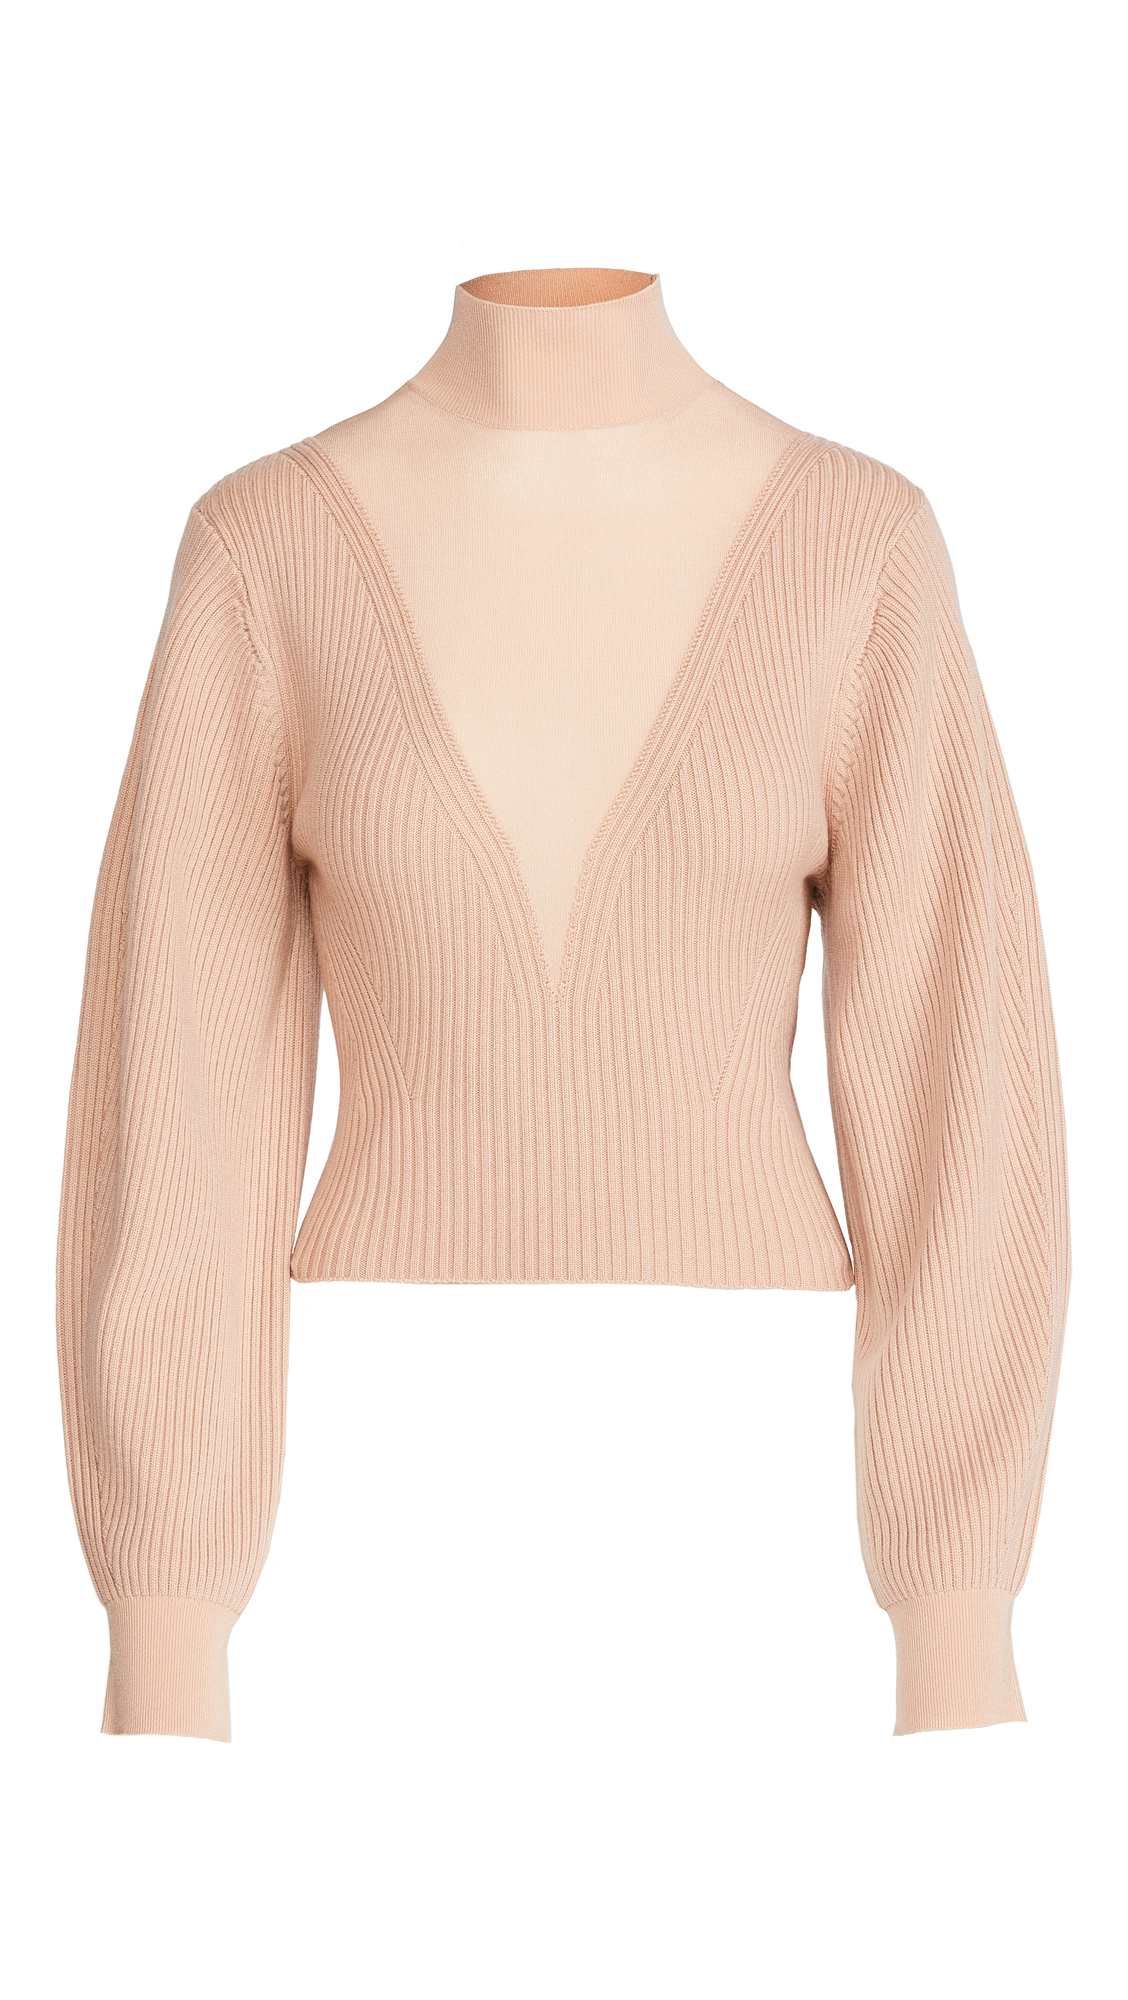 Dion Lee Merino Hosiery Sweater